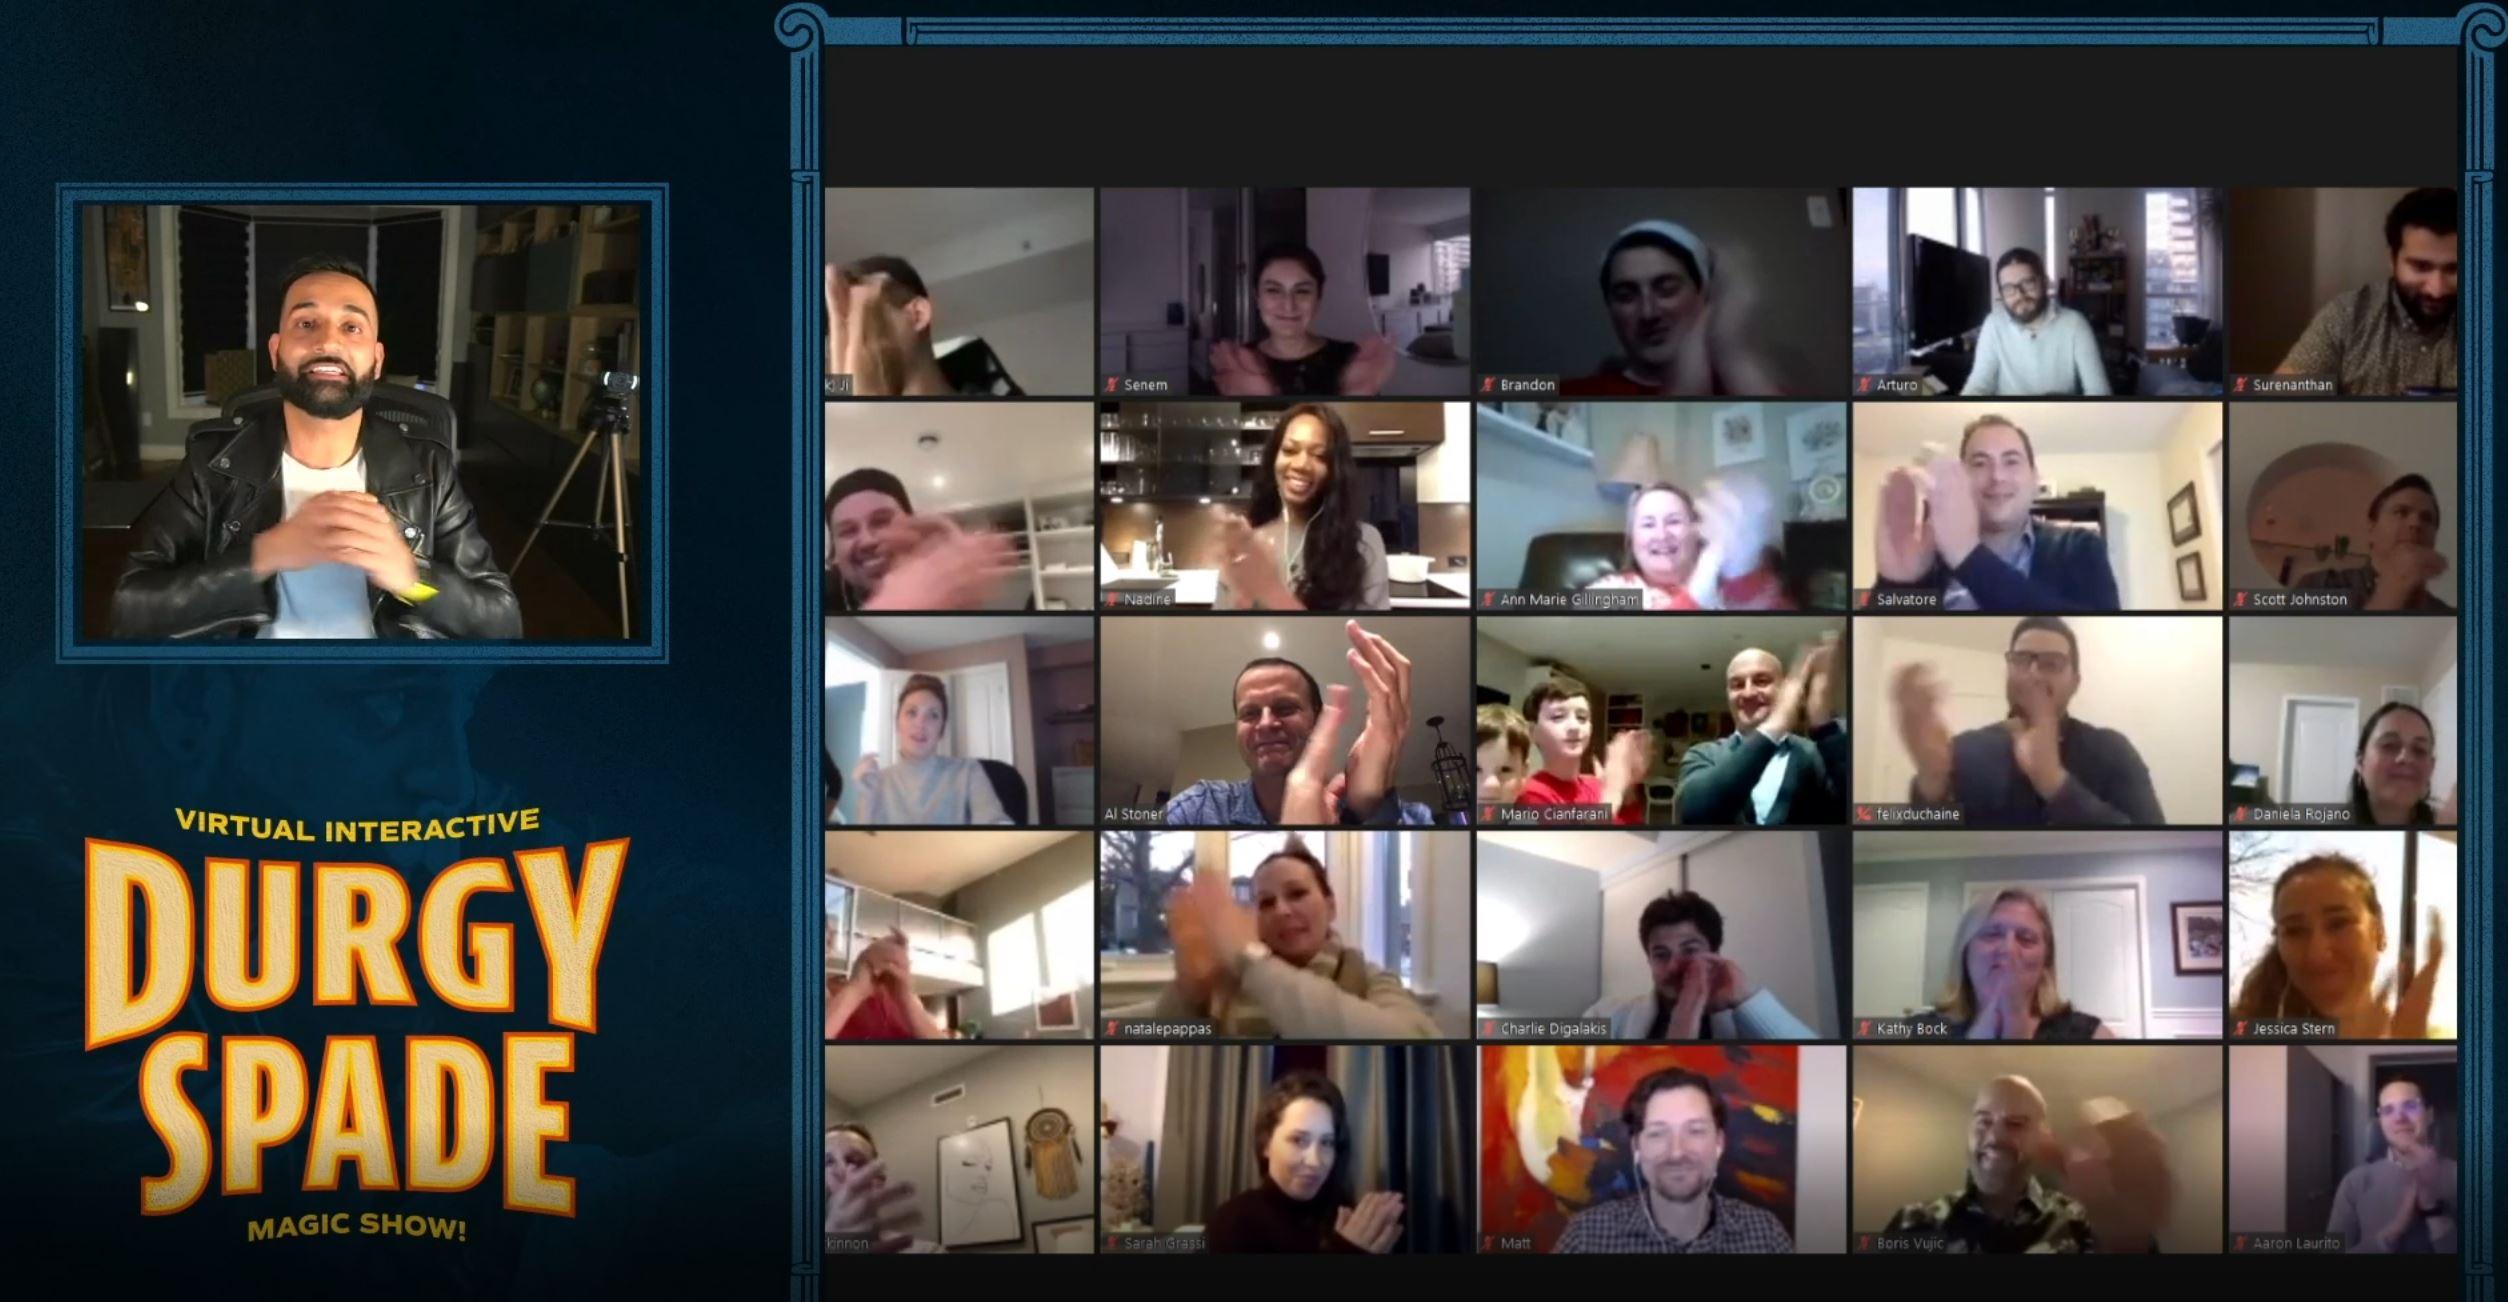 Screenshot from Toronto Virtual Magic Show with Durgy Spade